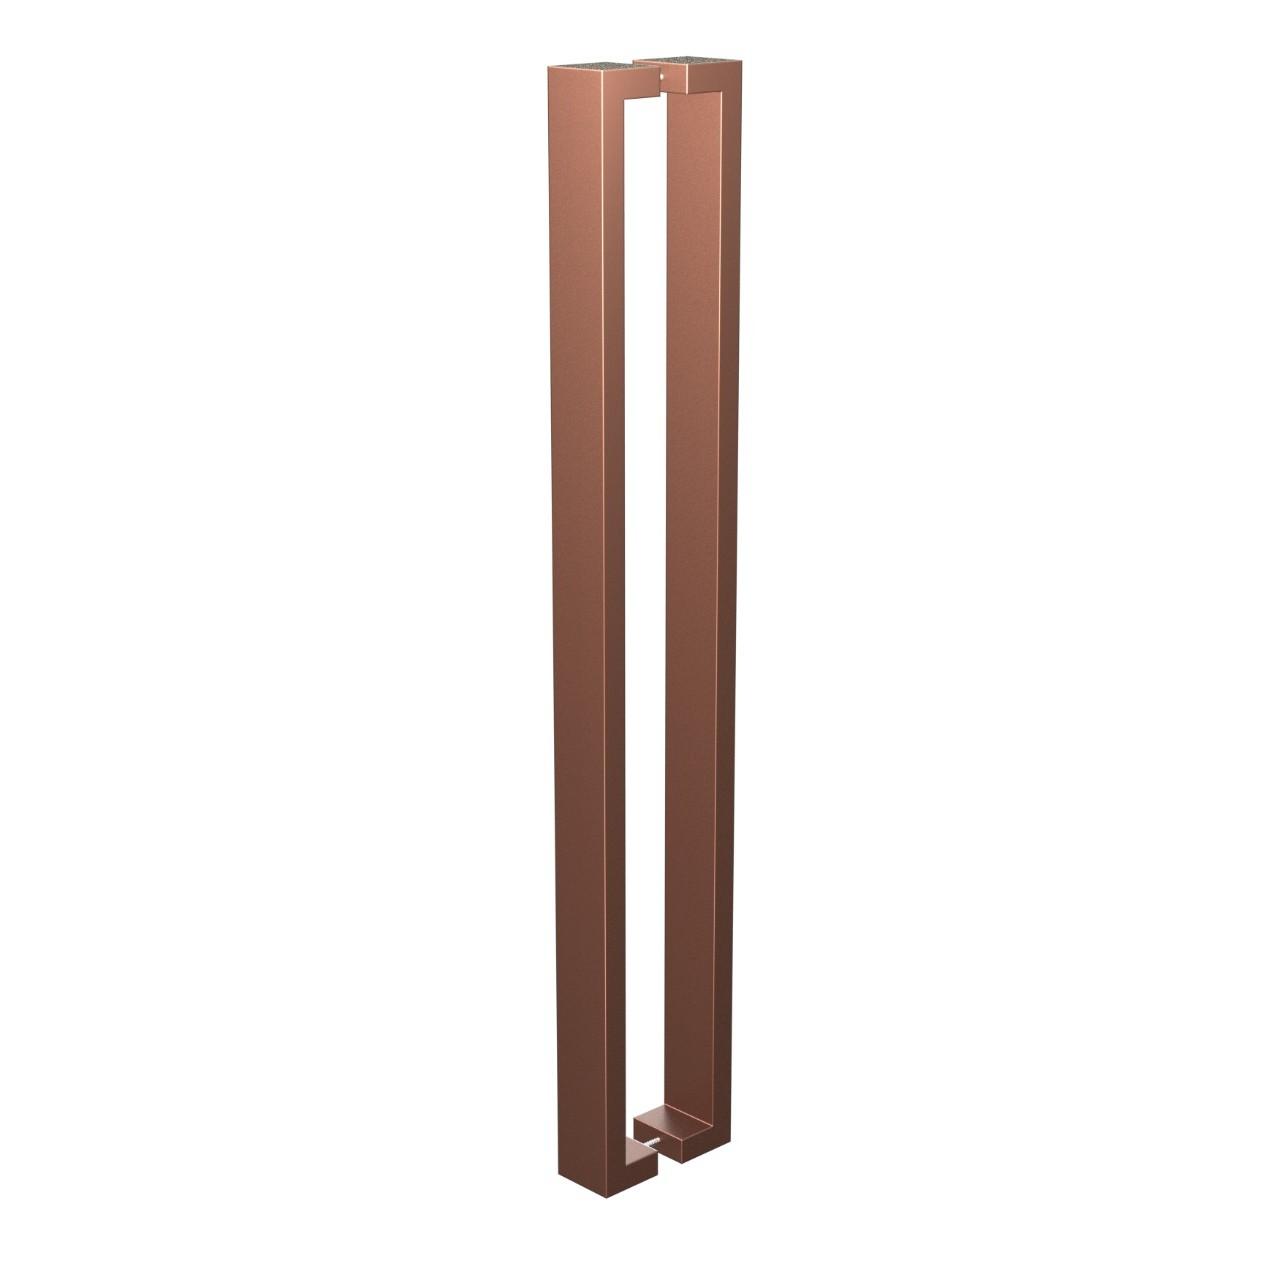 Puxador de Portas Sobrepor Aco Inox 815 cm 1 par Leblon Bronze - Acobrasil